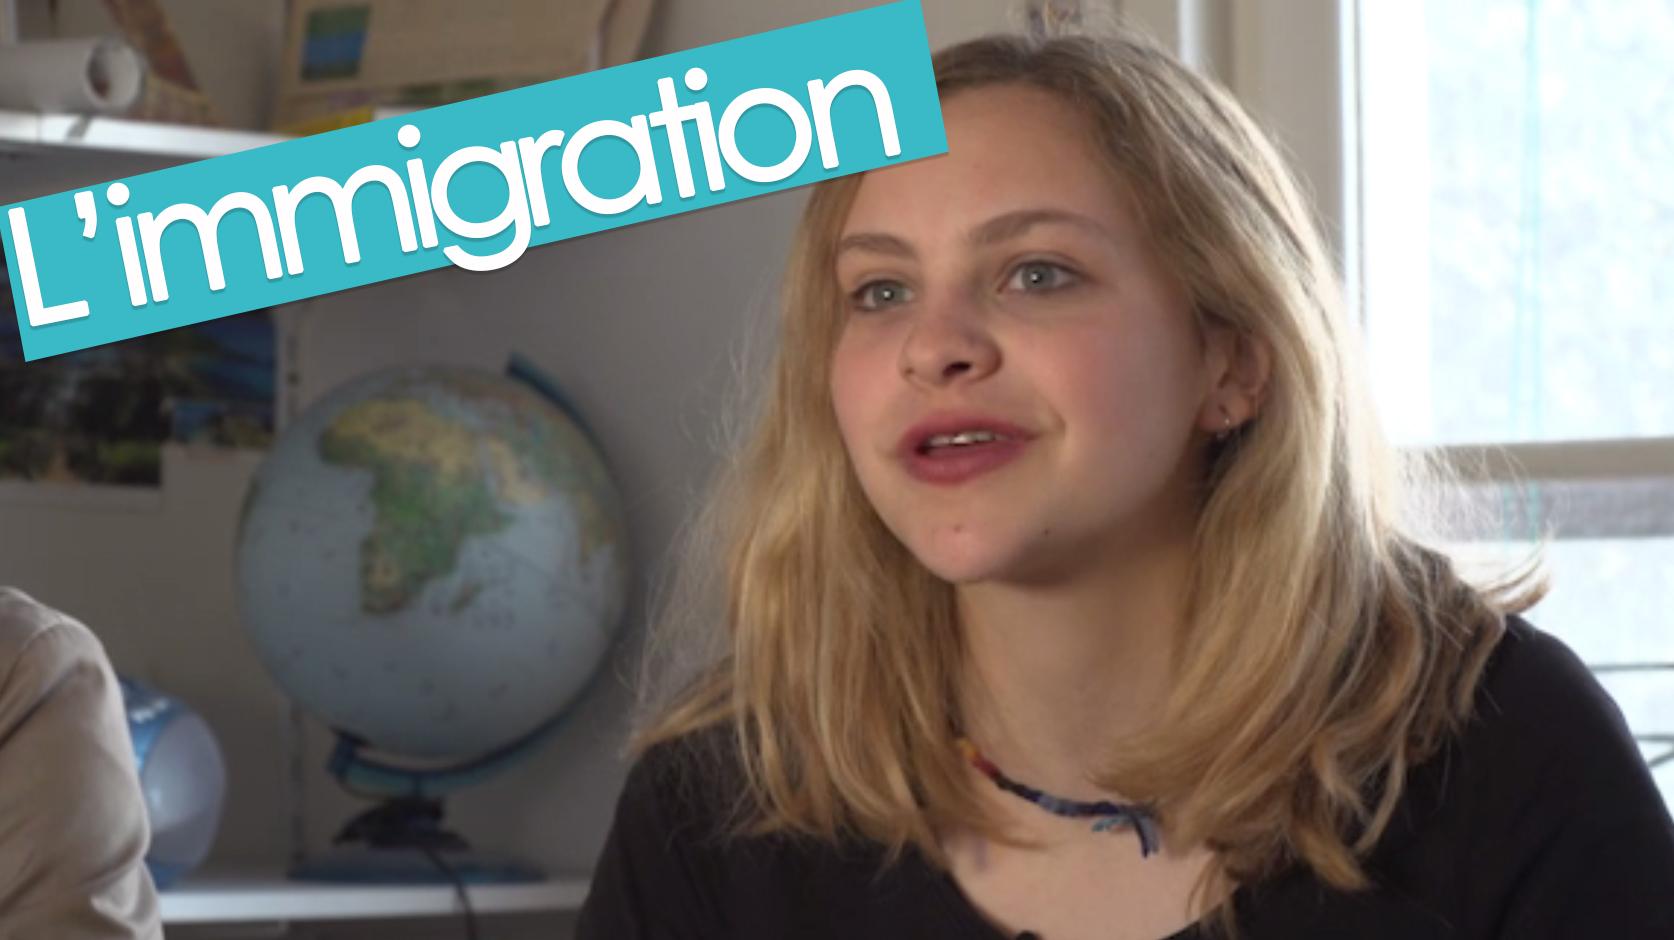 L'immigration screenshot